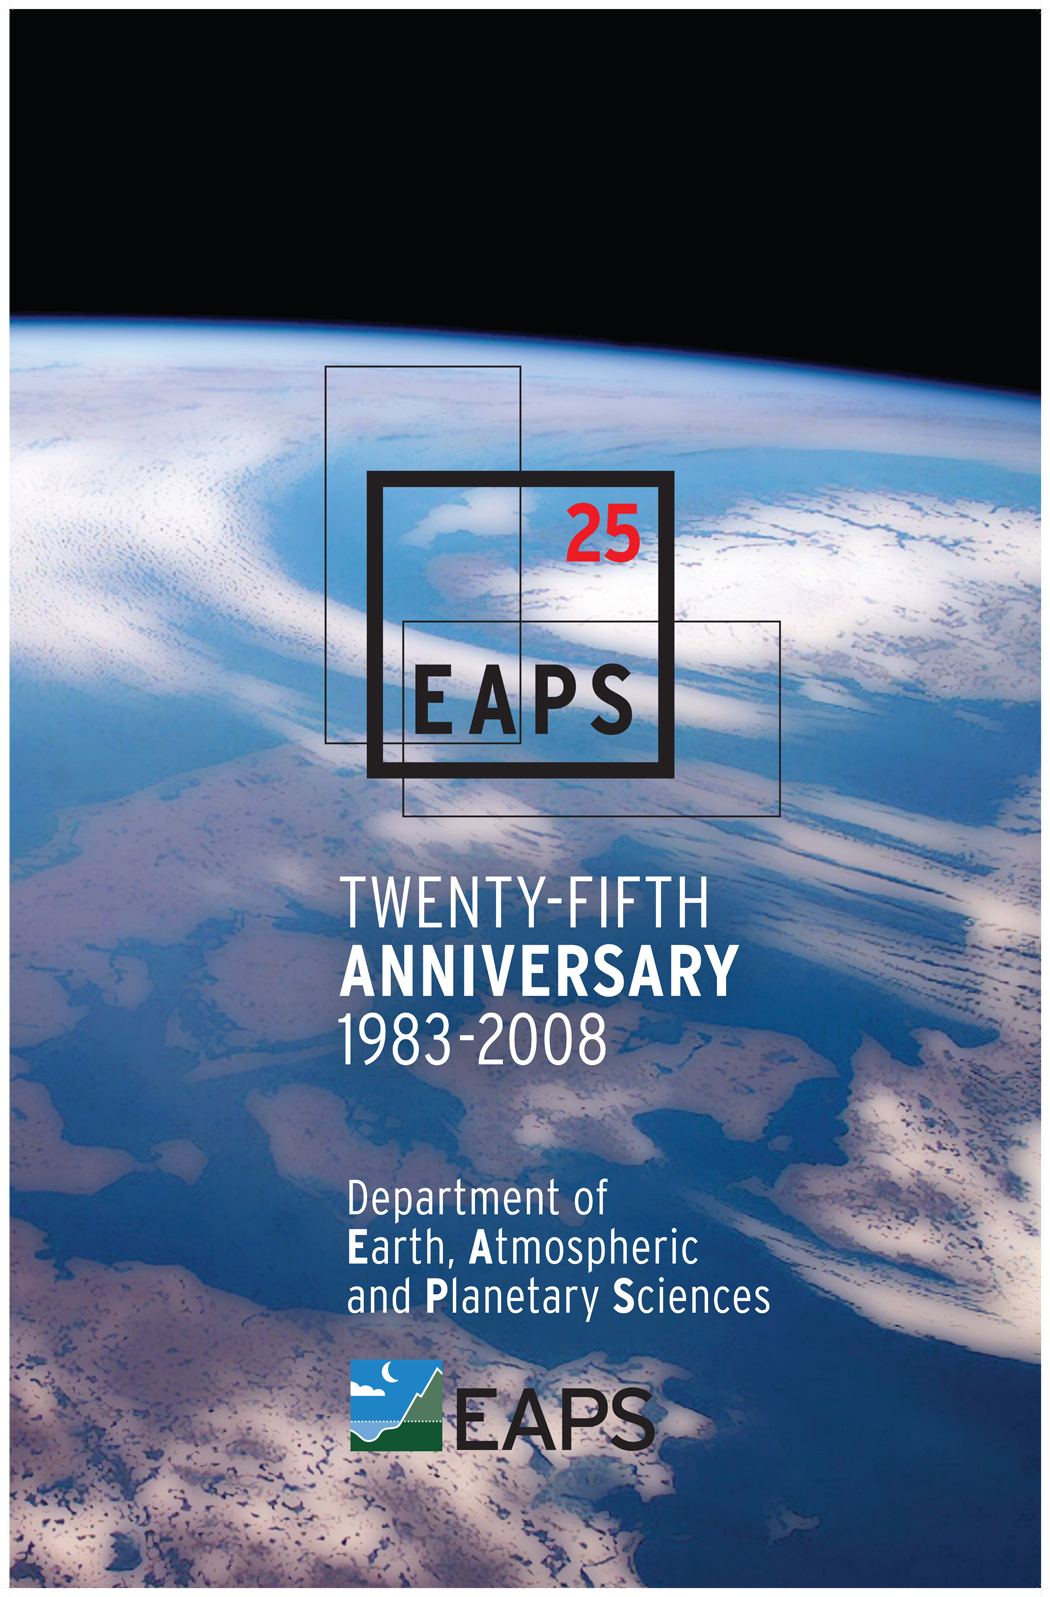 EAPS_25th_Poster1A.jpg